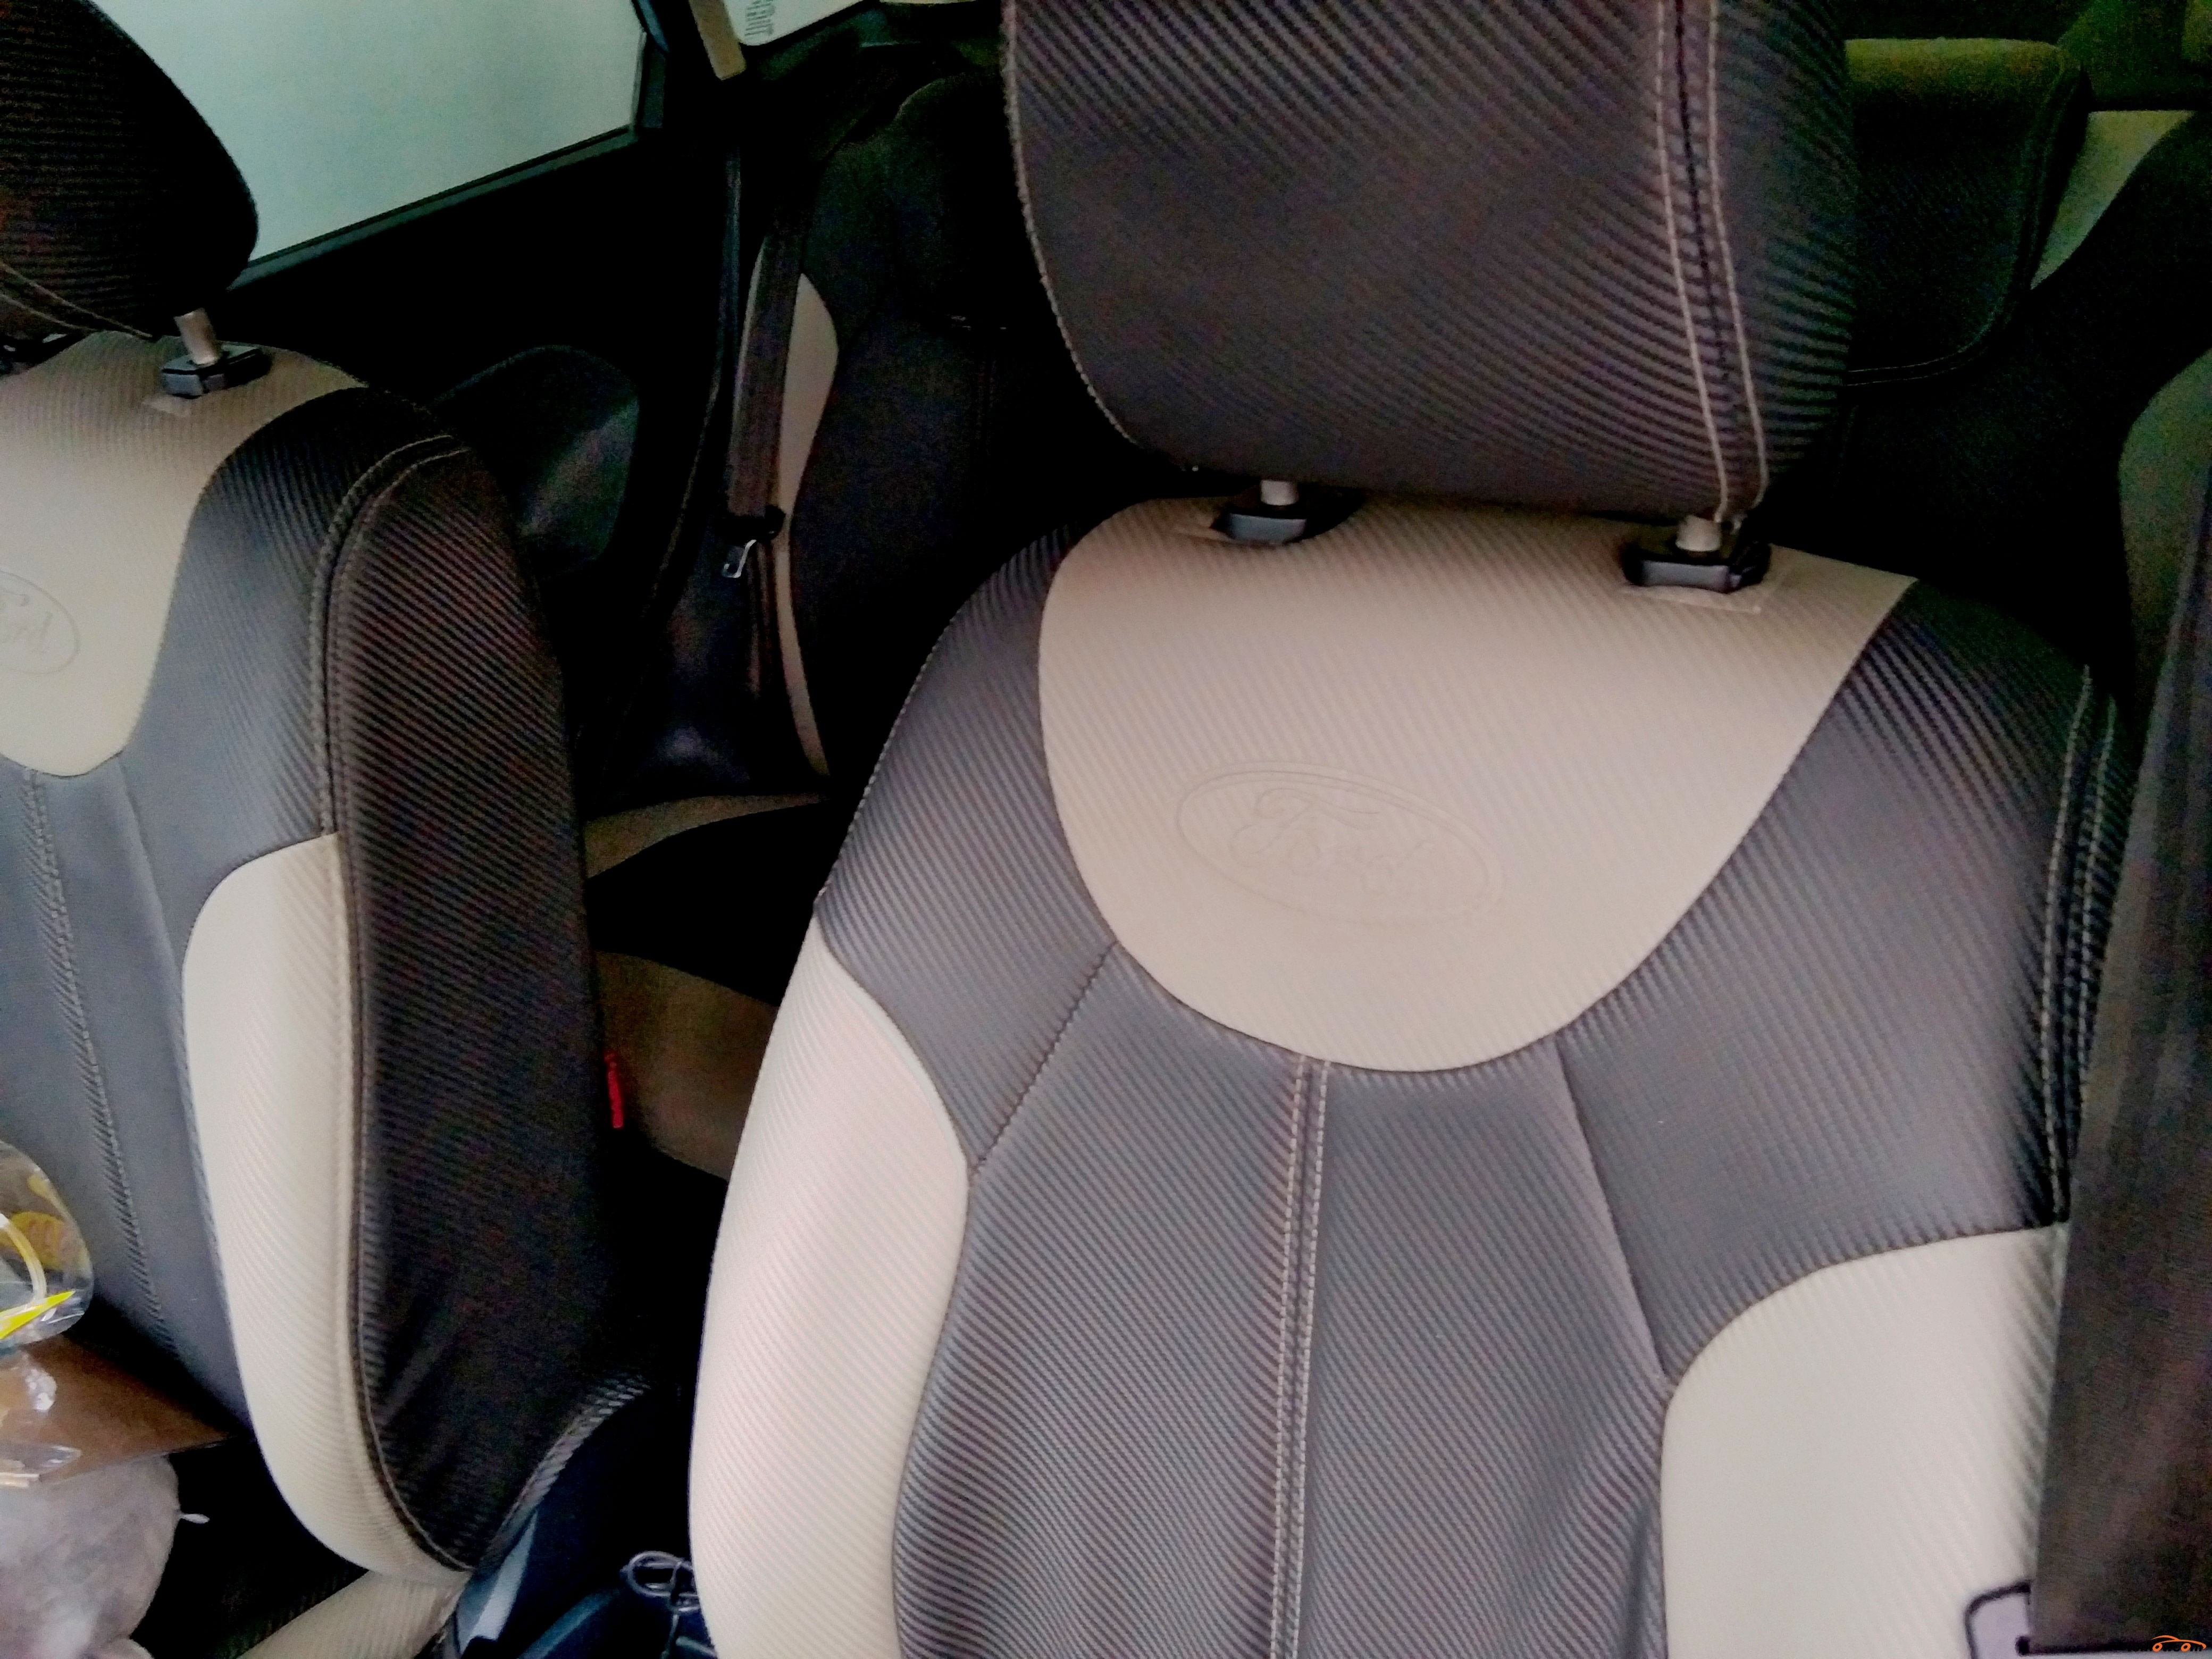 Ford Fiesta 2012 - 4